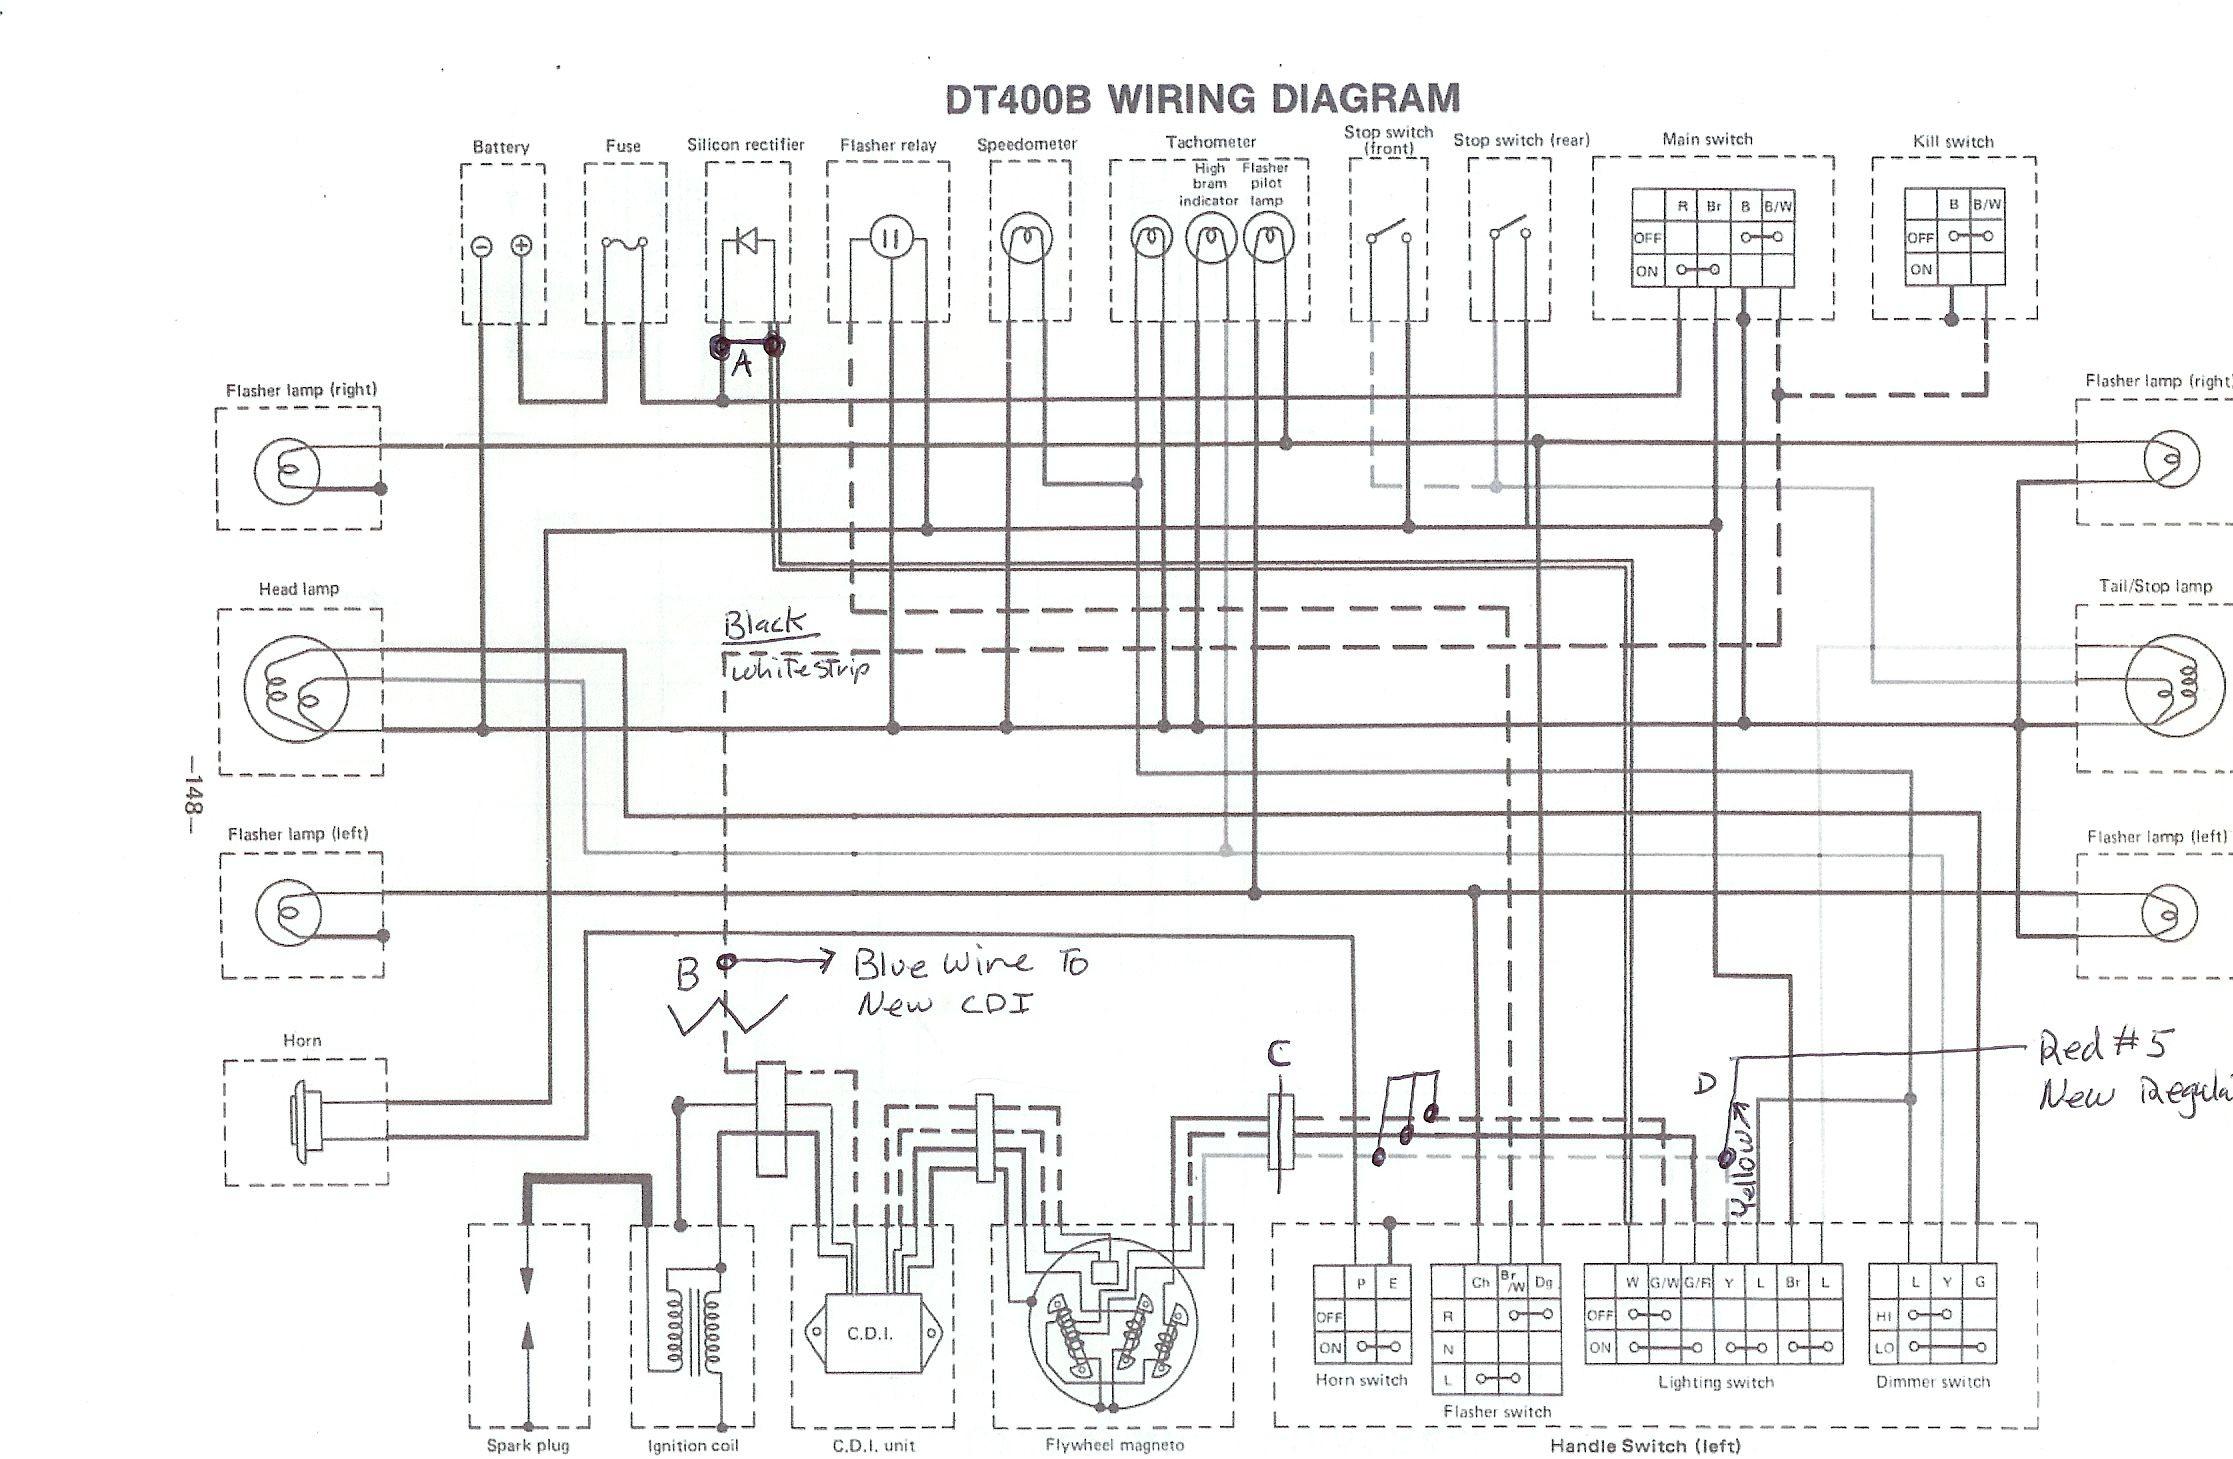 1972 Yamaha Enduro Wiring Diagram yamaha rx 100 wiring ... on